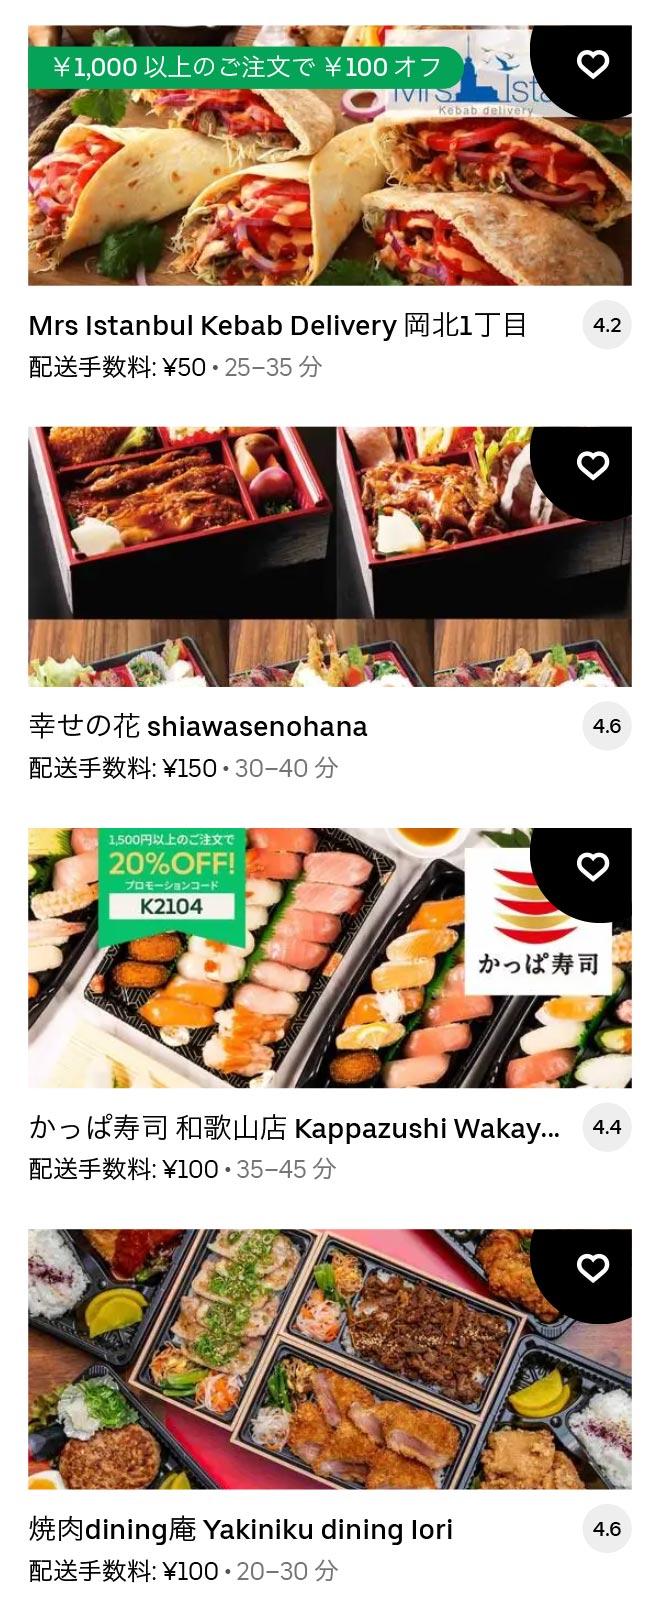 U wakayama menu 2104 09